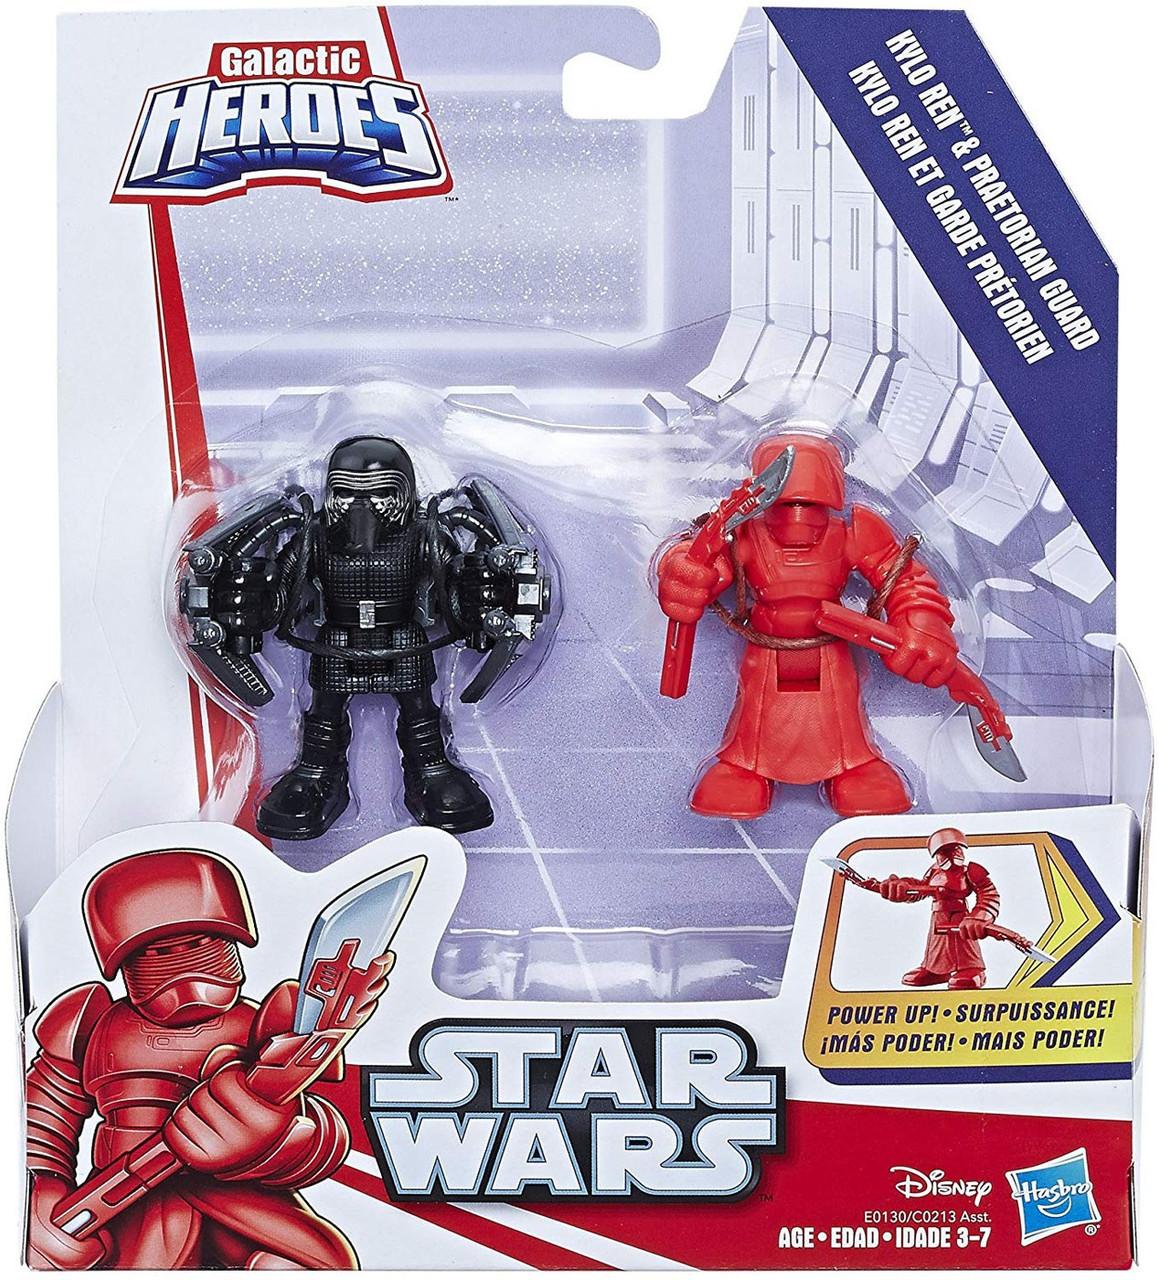 *NEW* Hasbro Star Wars Galactic Heroes Smugglers Scoundrels Range Trooper  B41 1